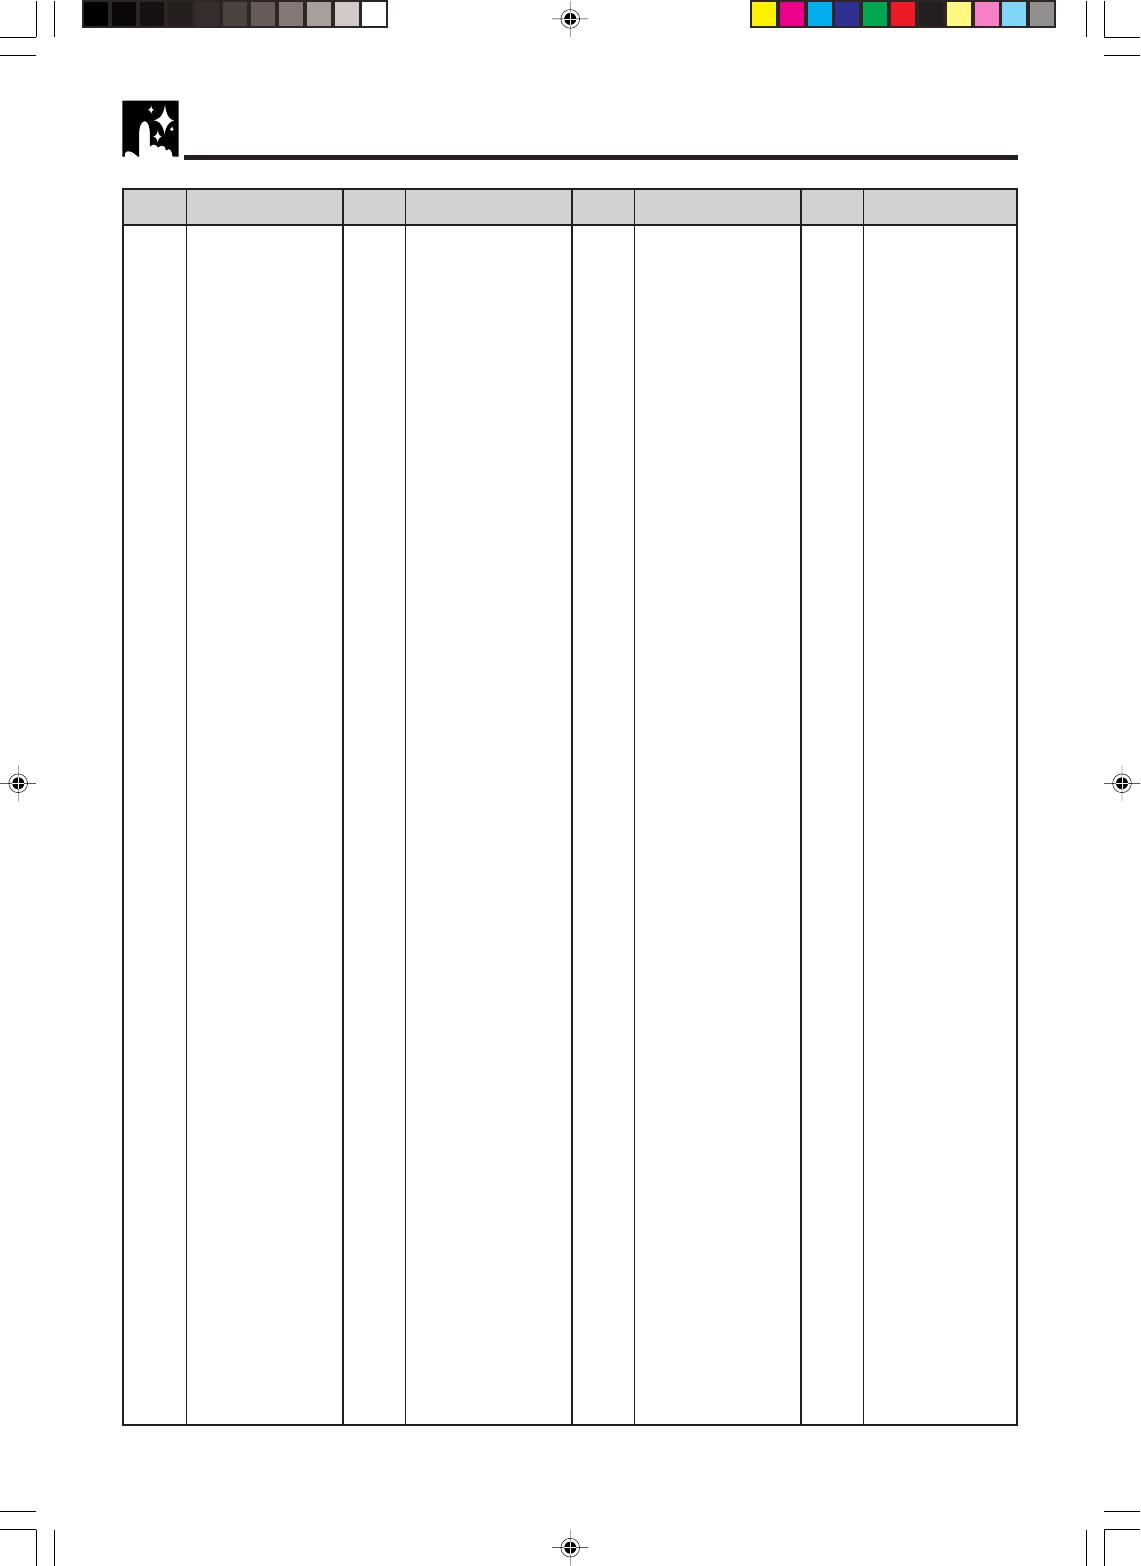 Handleiding Sharp dv nc 65 (pagina 55 van 102) (English)